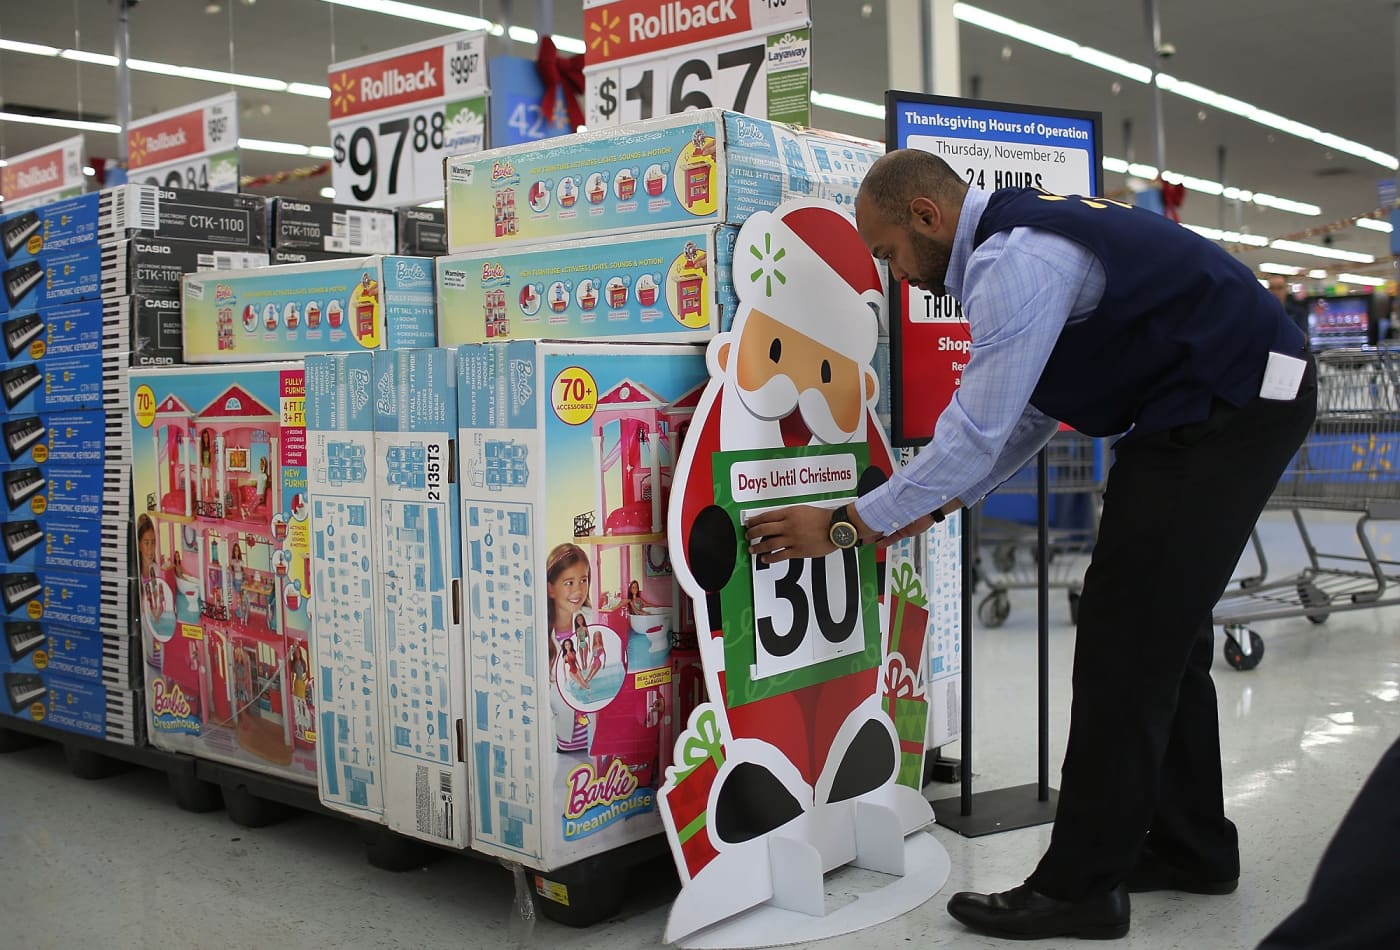 How To Land A Job At Walmart